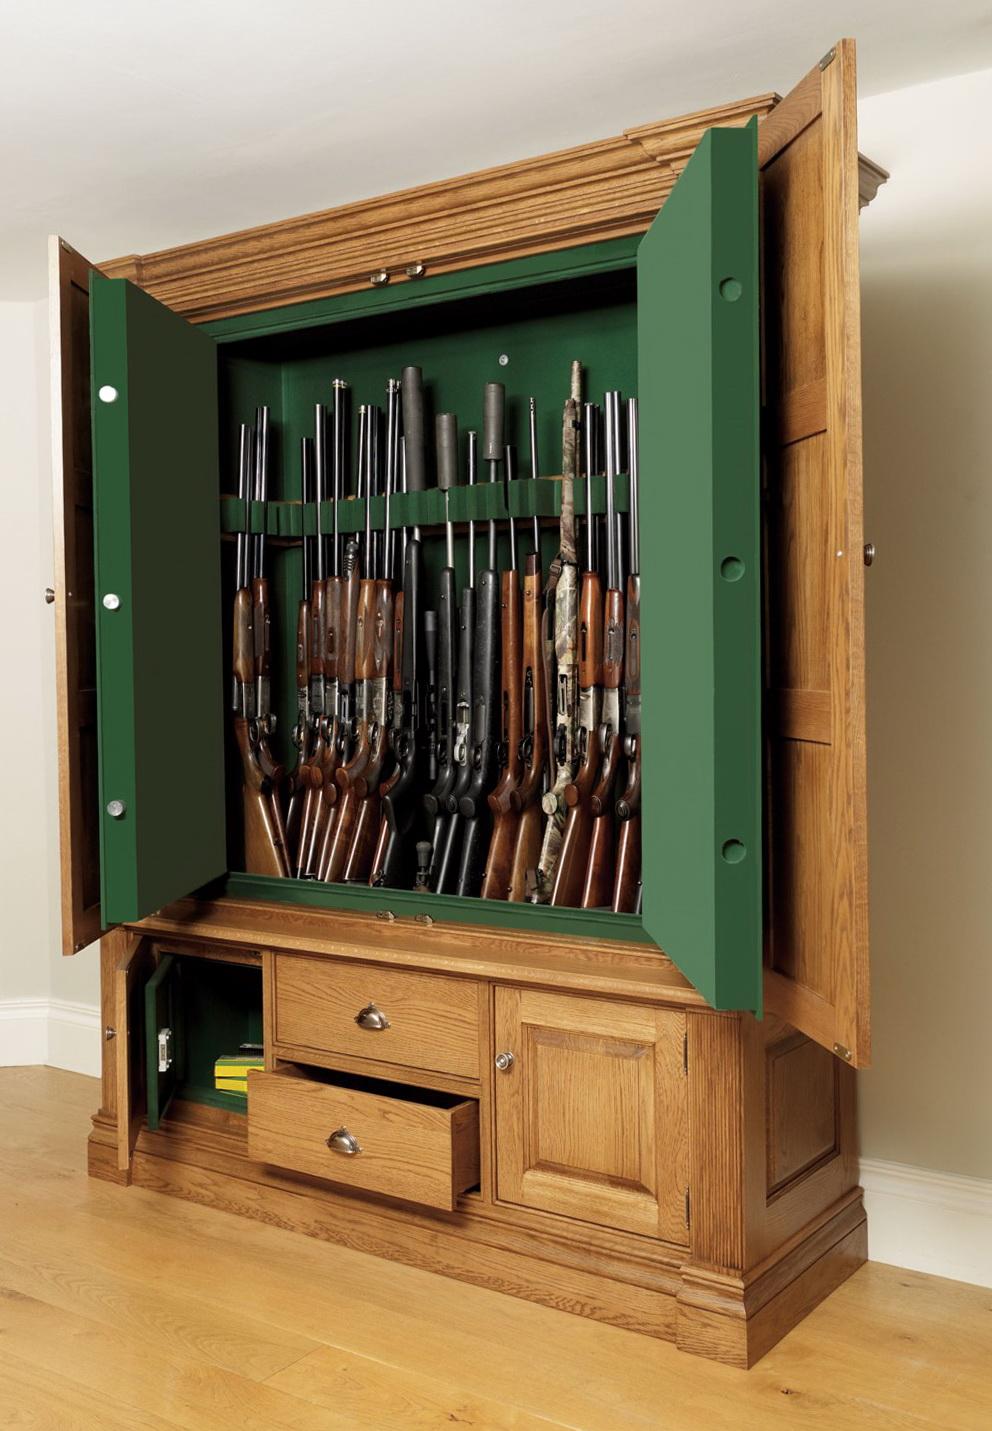 Wooden Gun Cabinet With Deer Etching